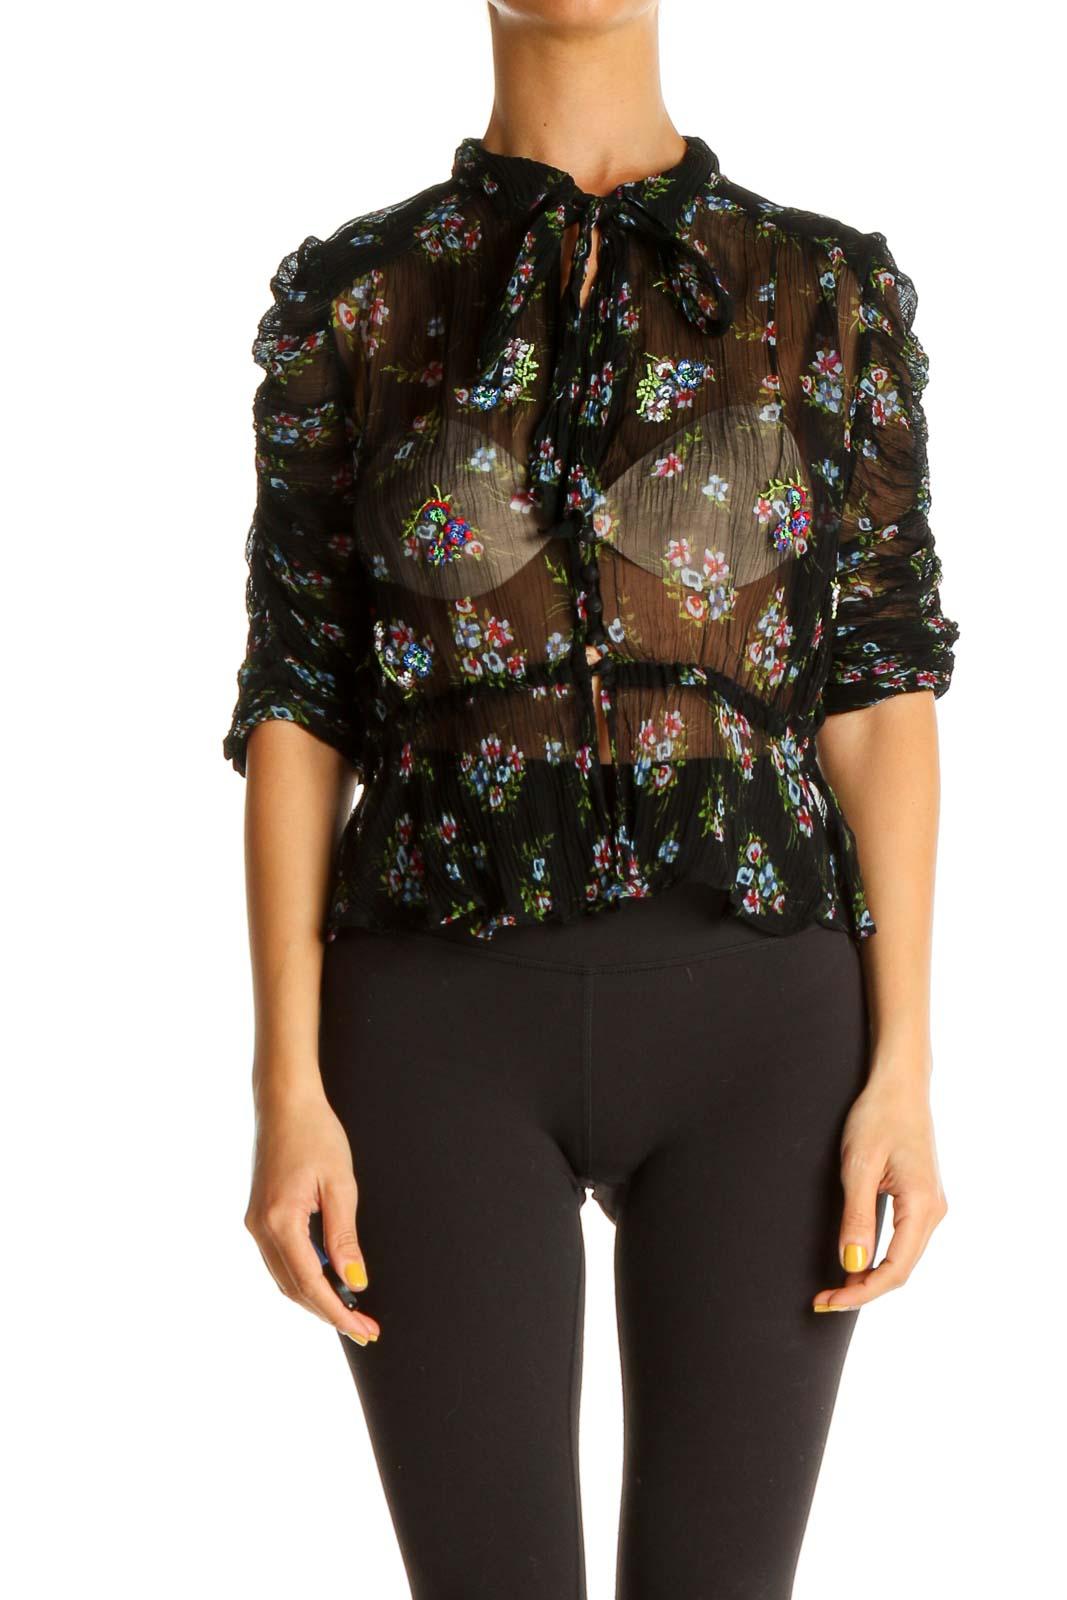 Black Floral Print Bohemian Blouse Front